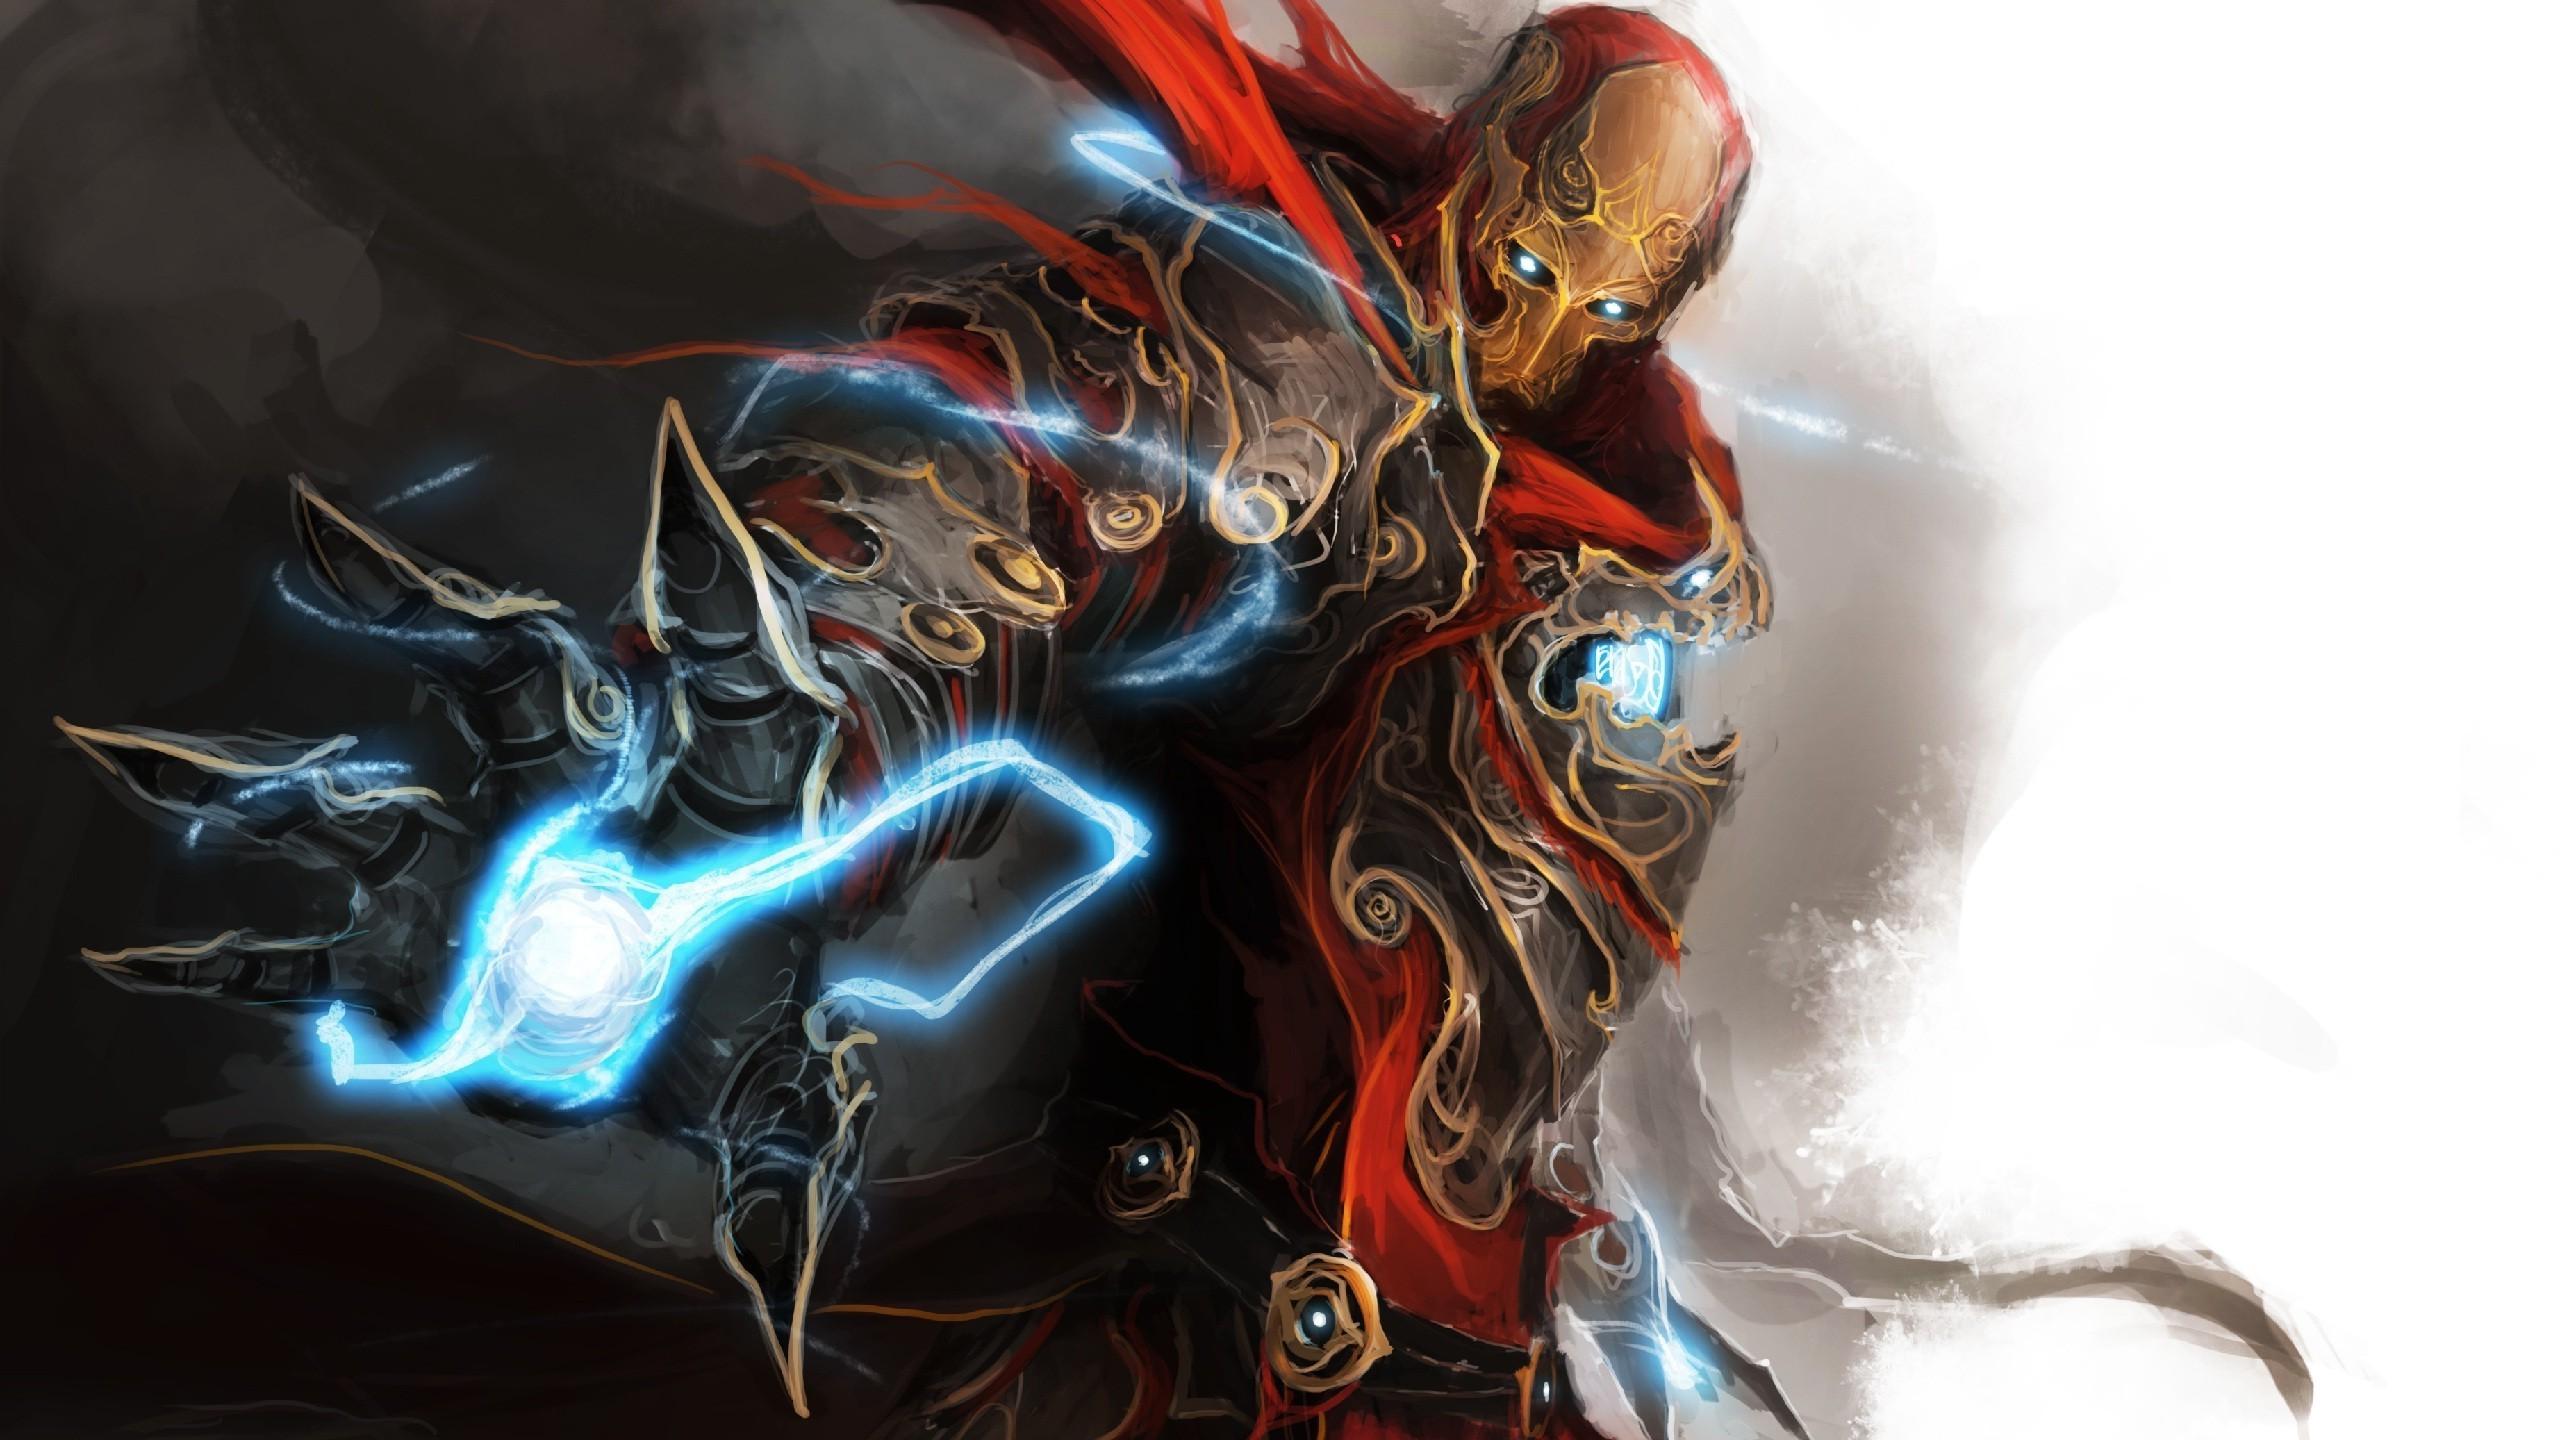 Wallpaper 2560x1440 Px Fantasy Art Iron Man 2560x1440 Wallup 1028914 Hd Wallpapers Wallhere